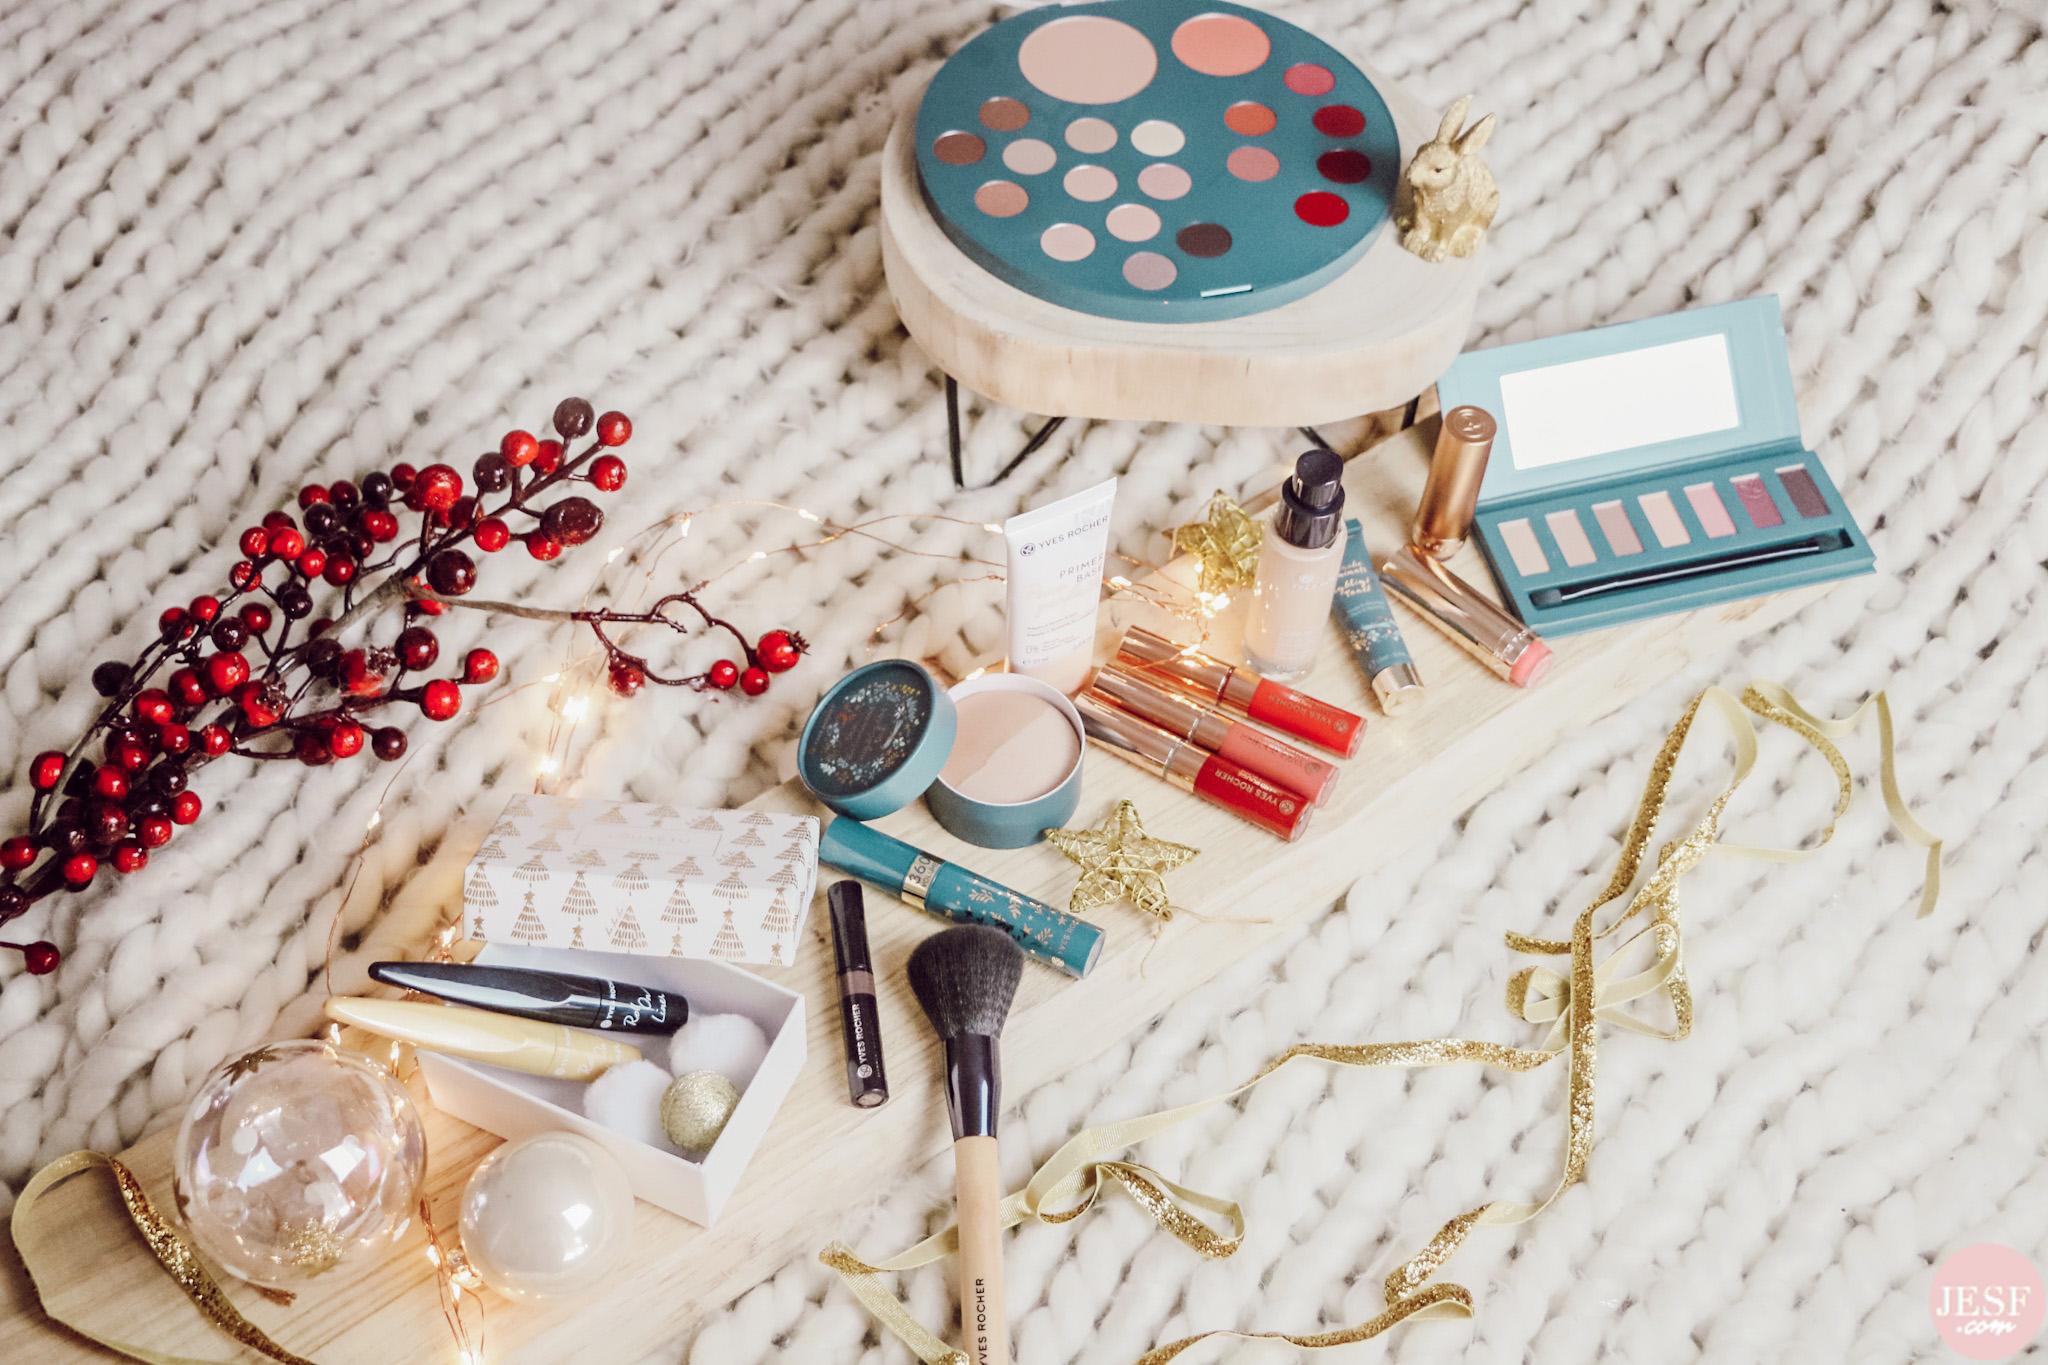 maquillage-yves-rocher-avis-makeup